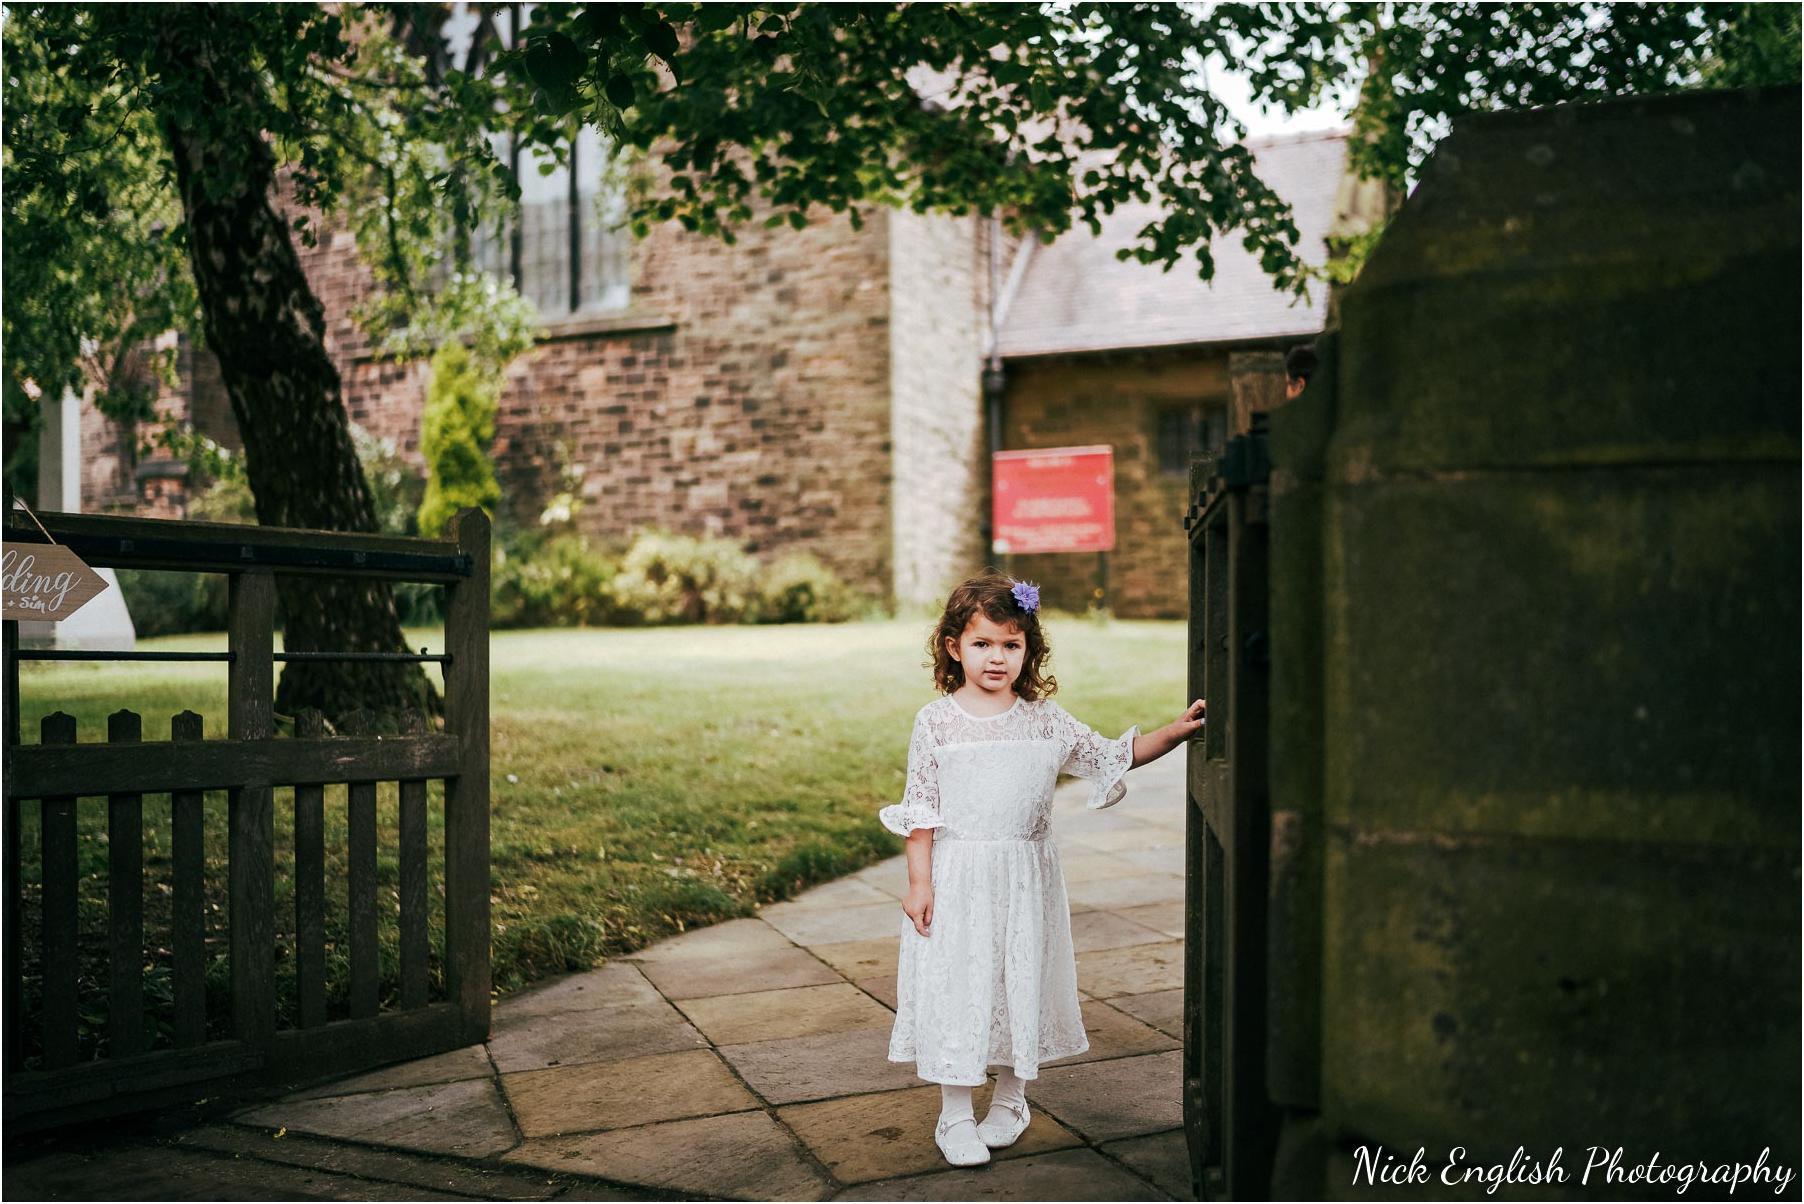 Whitebottom_Farm_Wedding_Manchester_Photograph-20.jpg